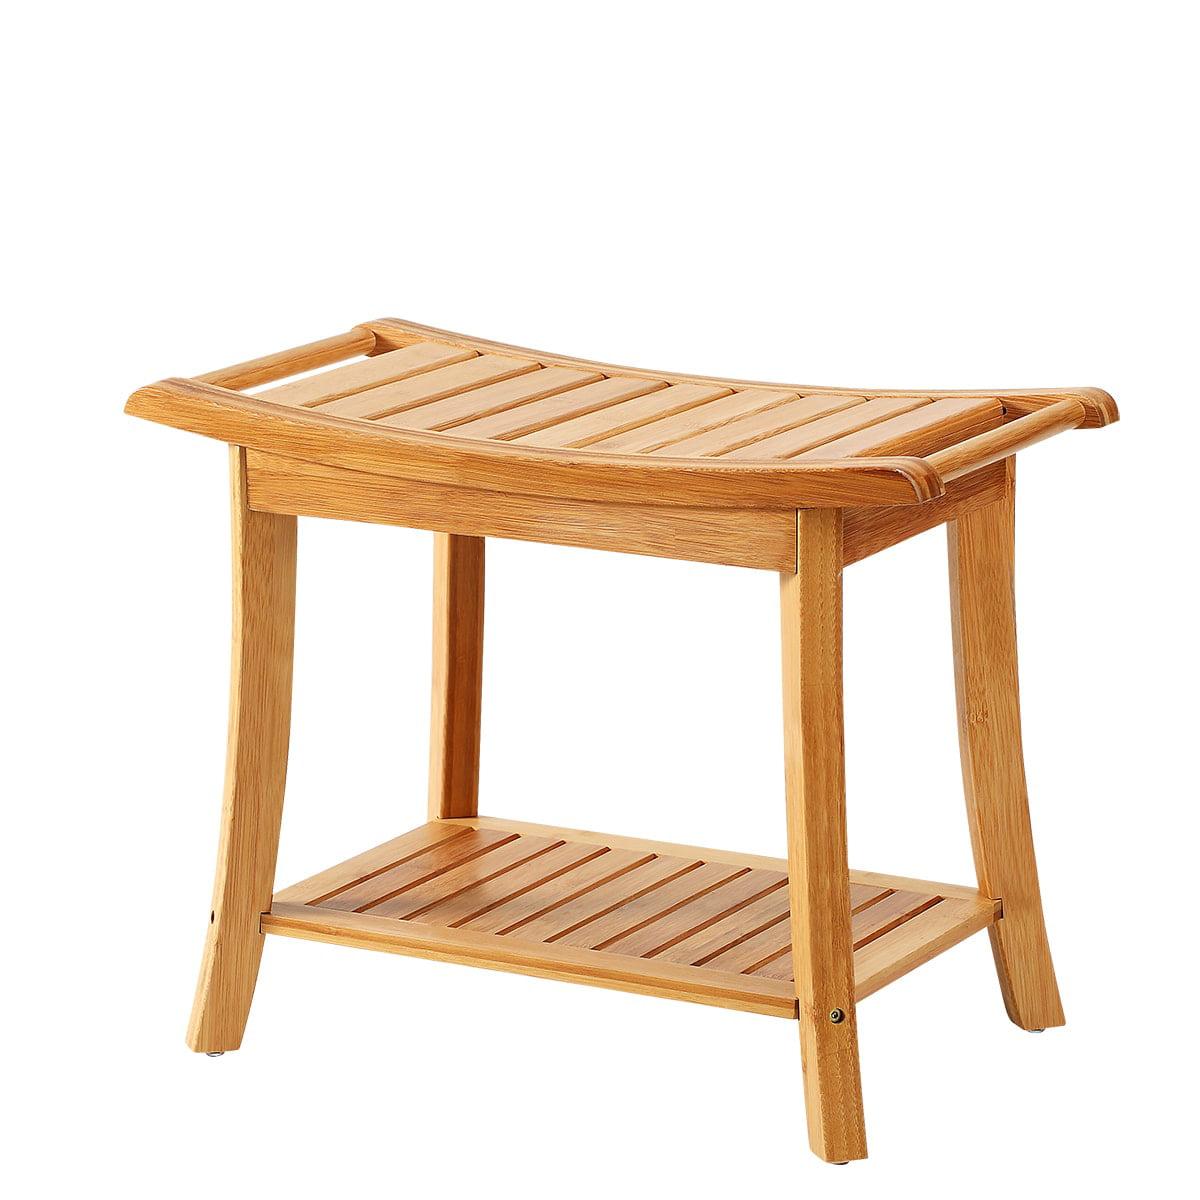 New Ridge Home Natural Bamboo Shower Bench Seat, Spa Bath Bench Shaving Stool with Storage Shelf